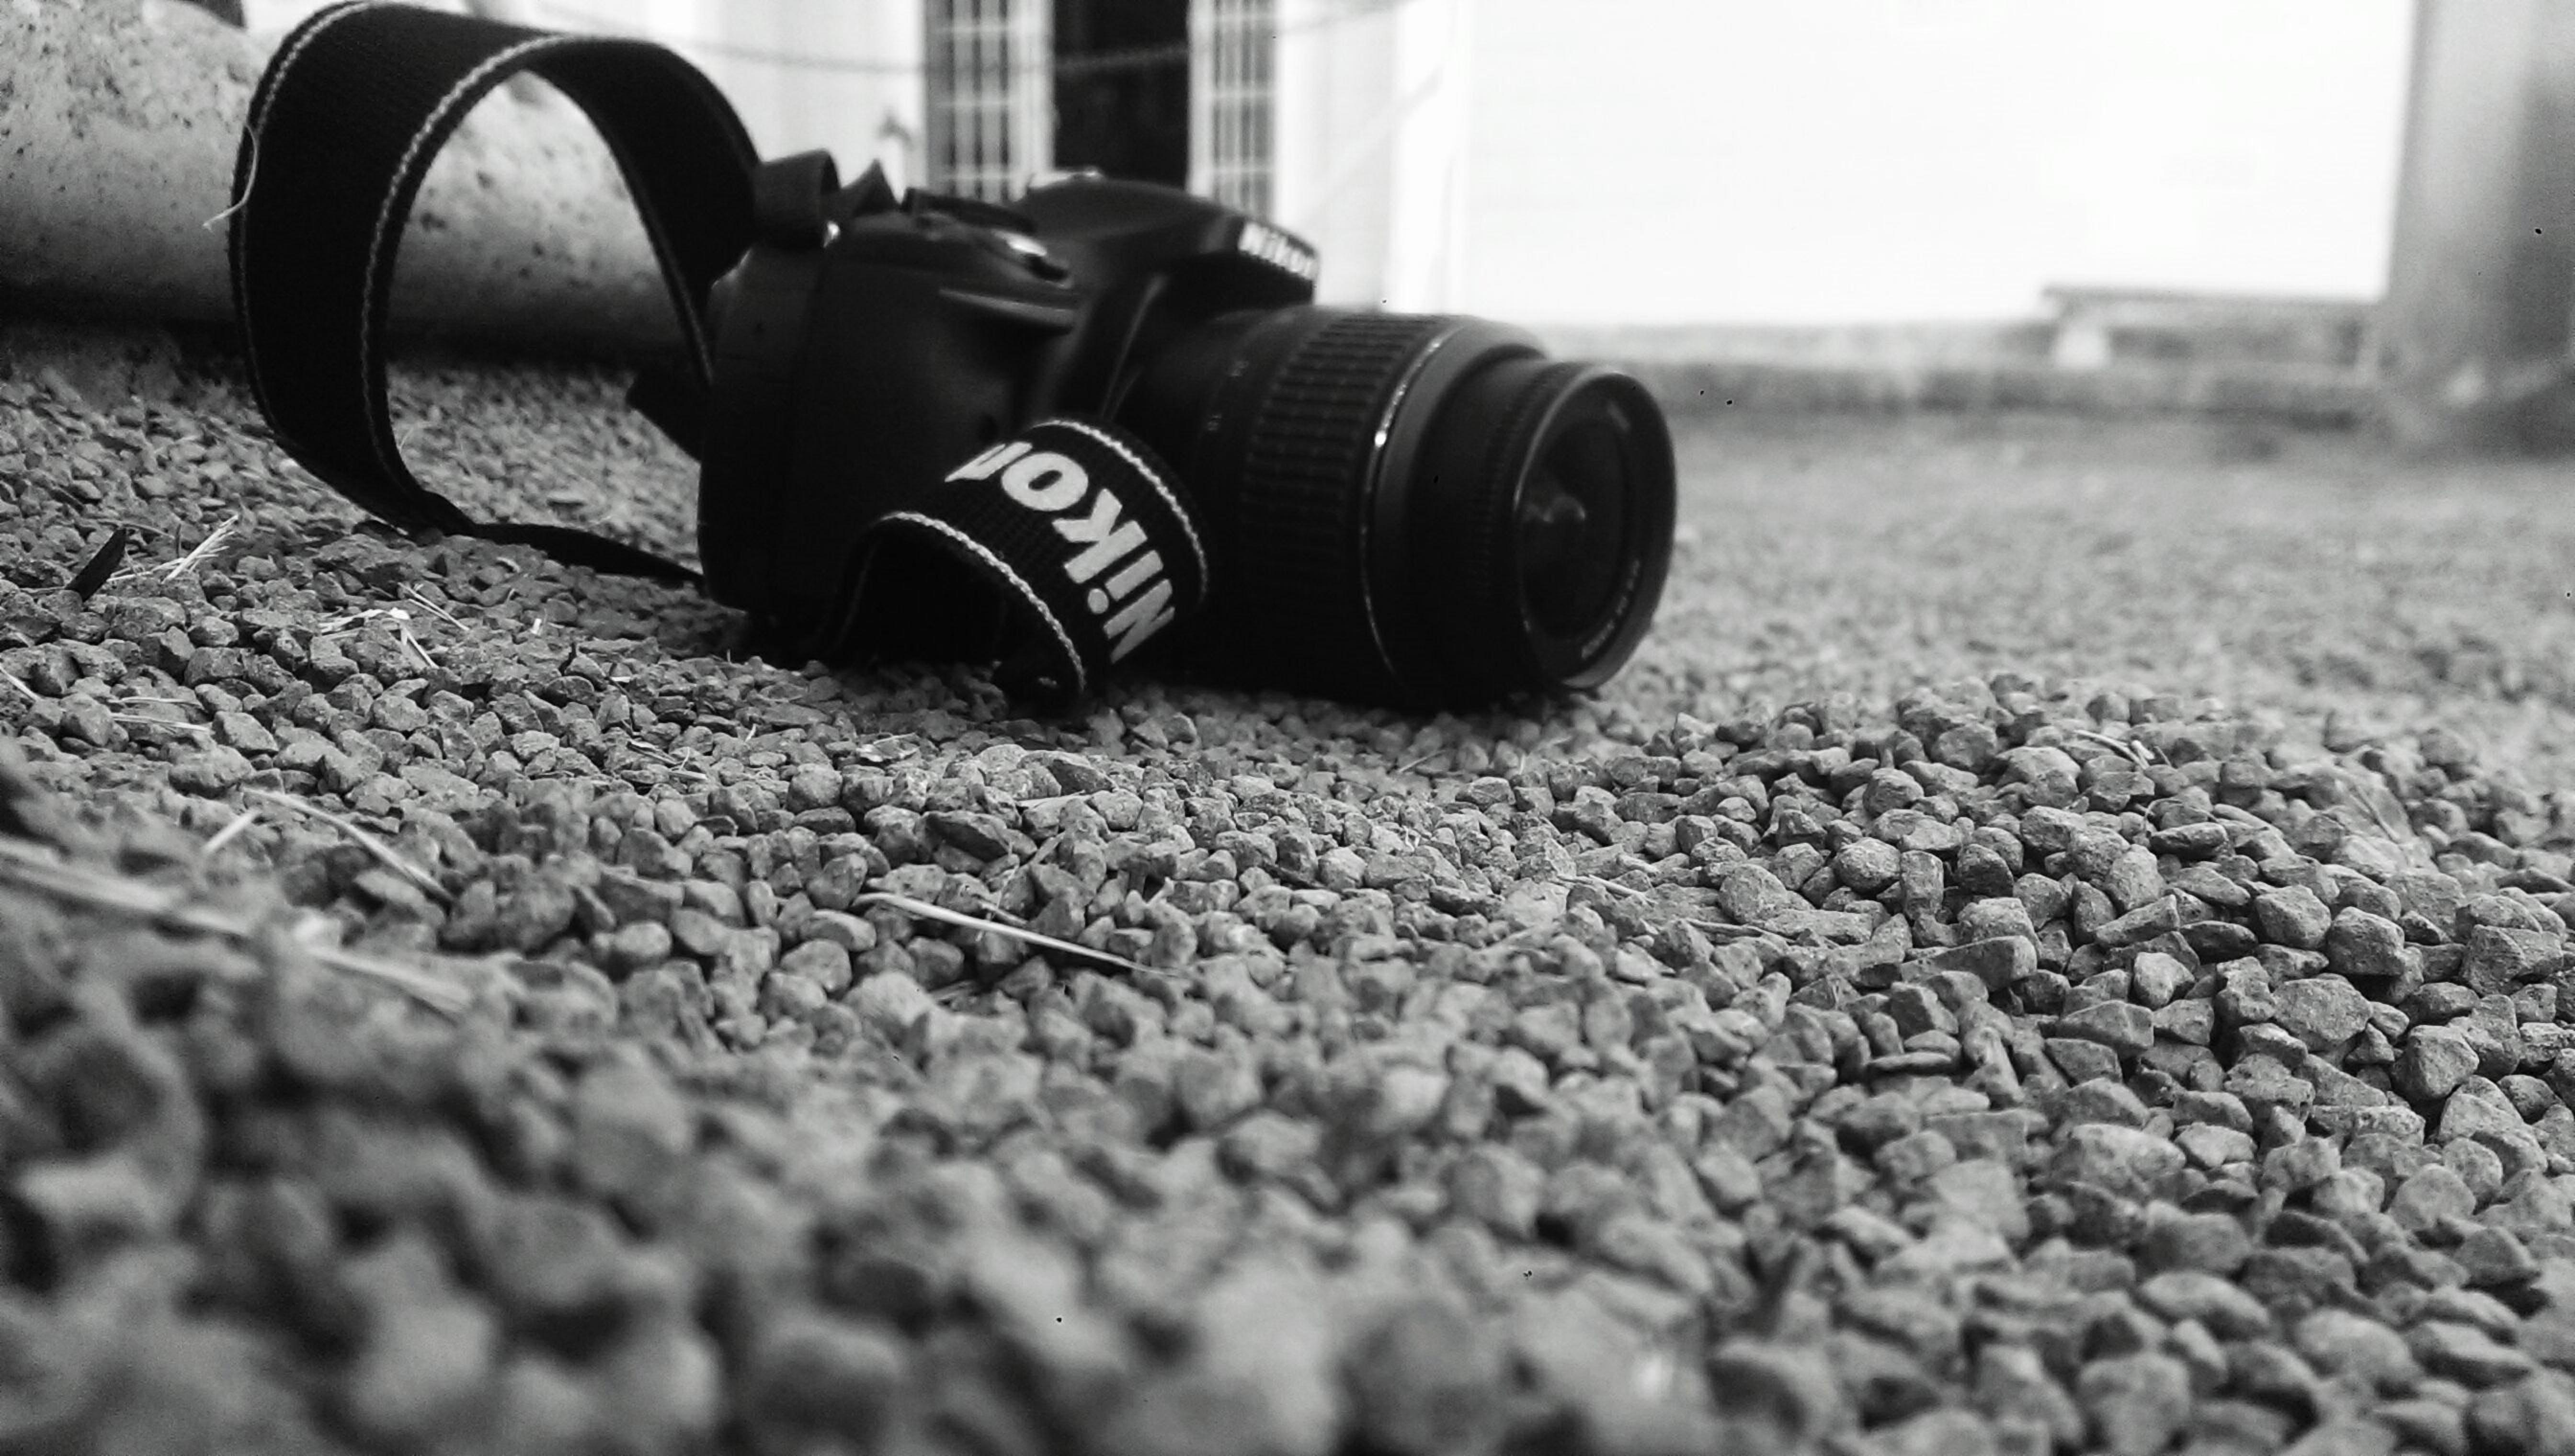 black-and-white, blur, camera